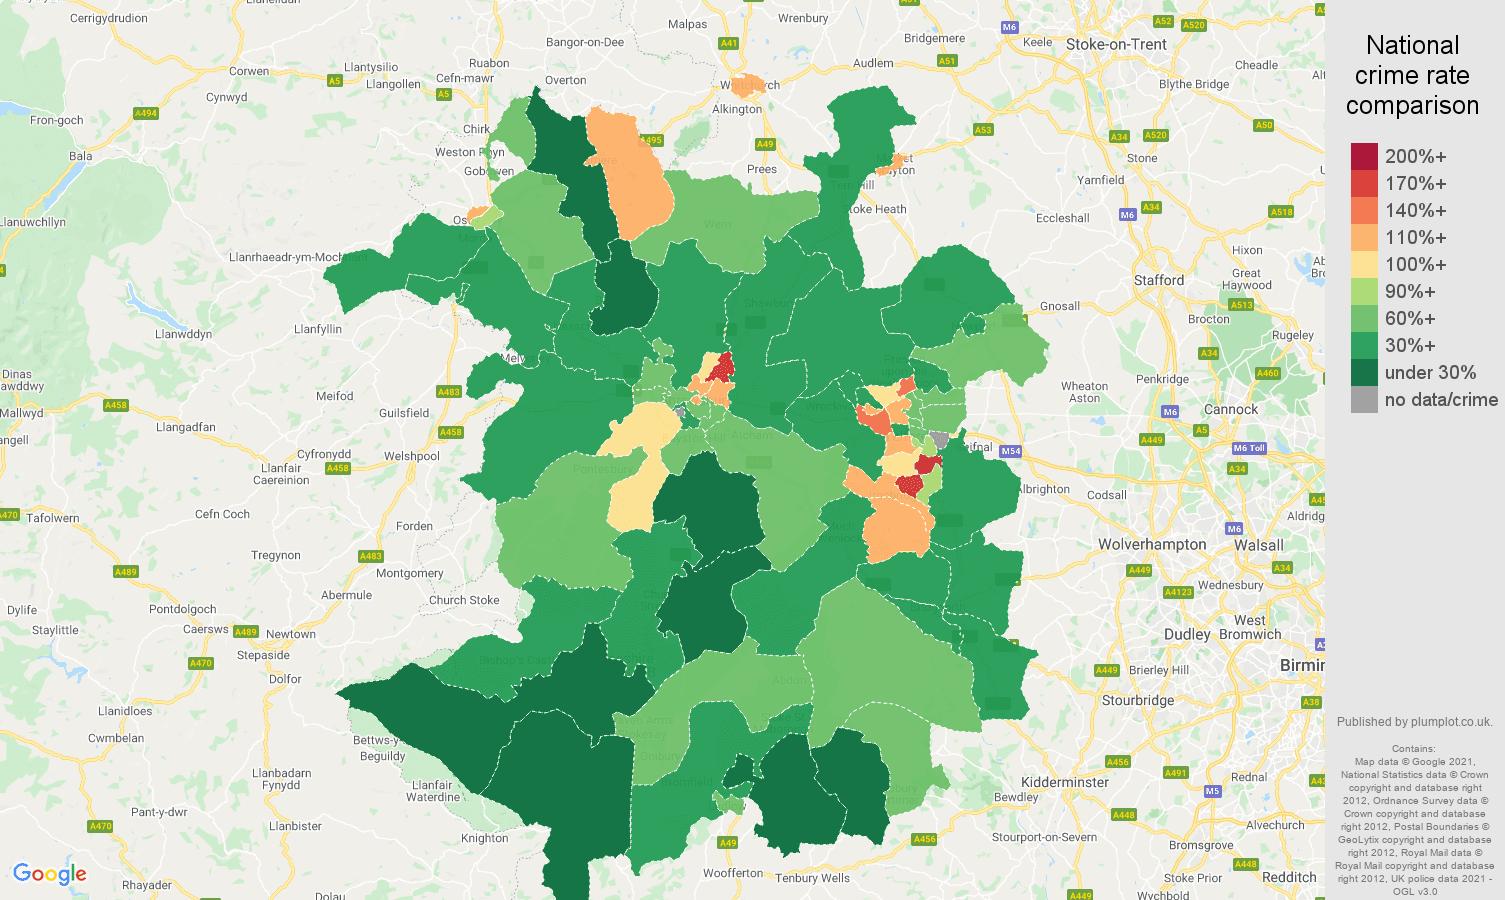 Shropshire criminal damage and arson crime rate comparison map